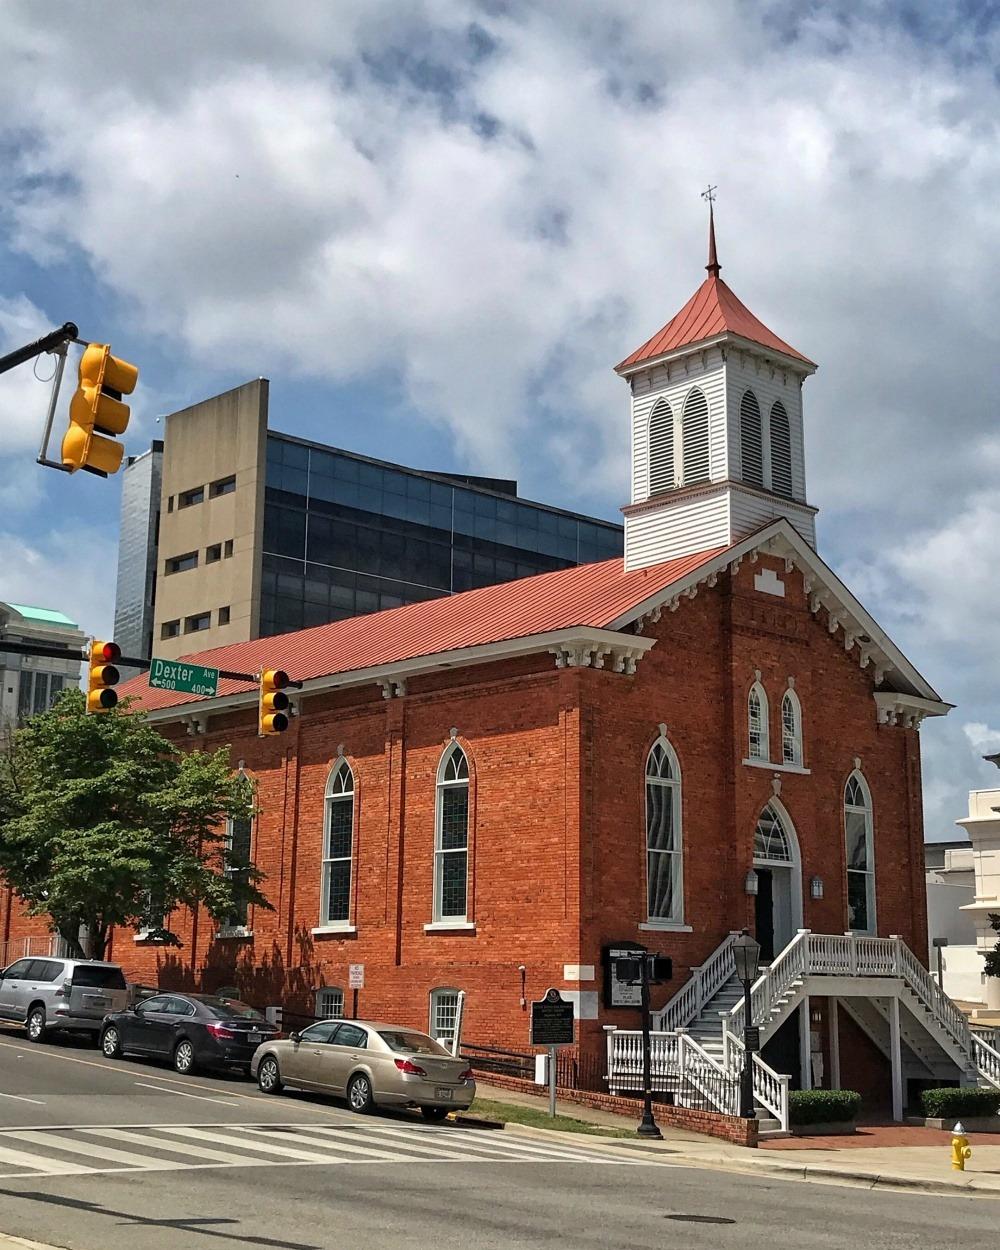 Dexter Avenue Baptist Church in Montgomery Alabama Photo Heatheronhertravels.com